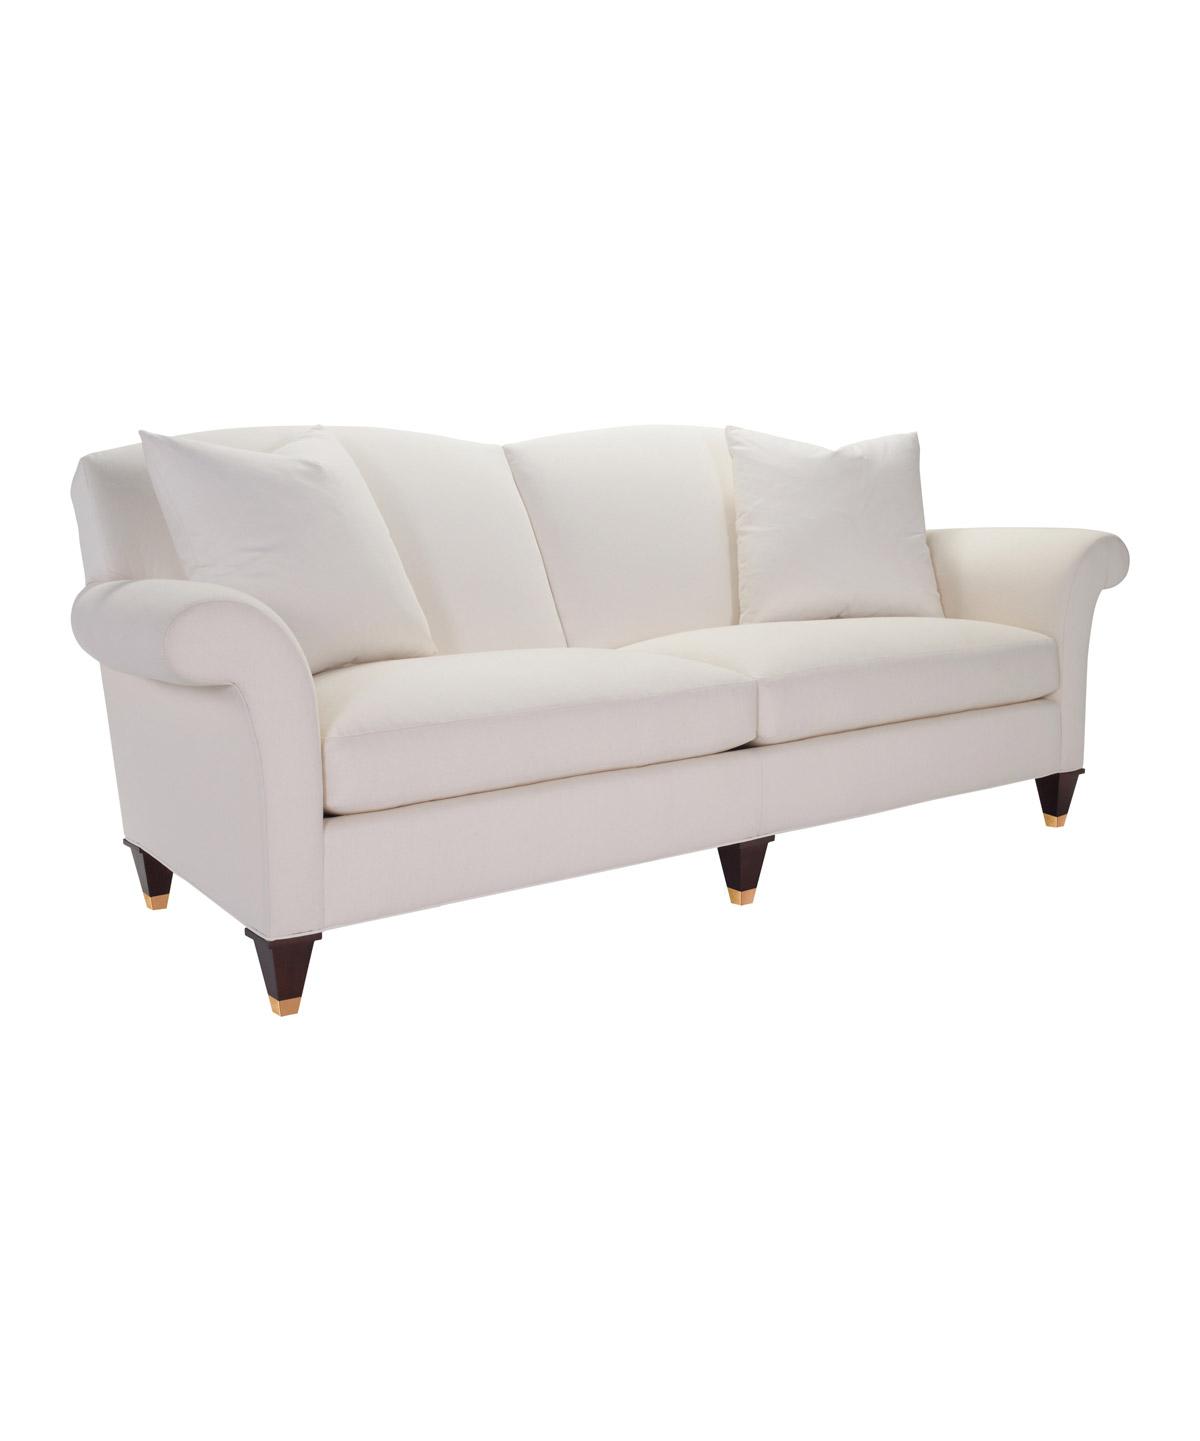 Irenee Sofa